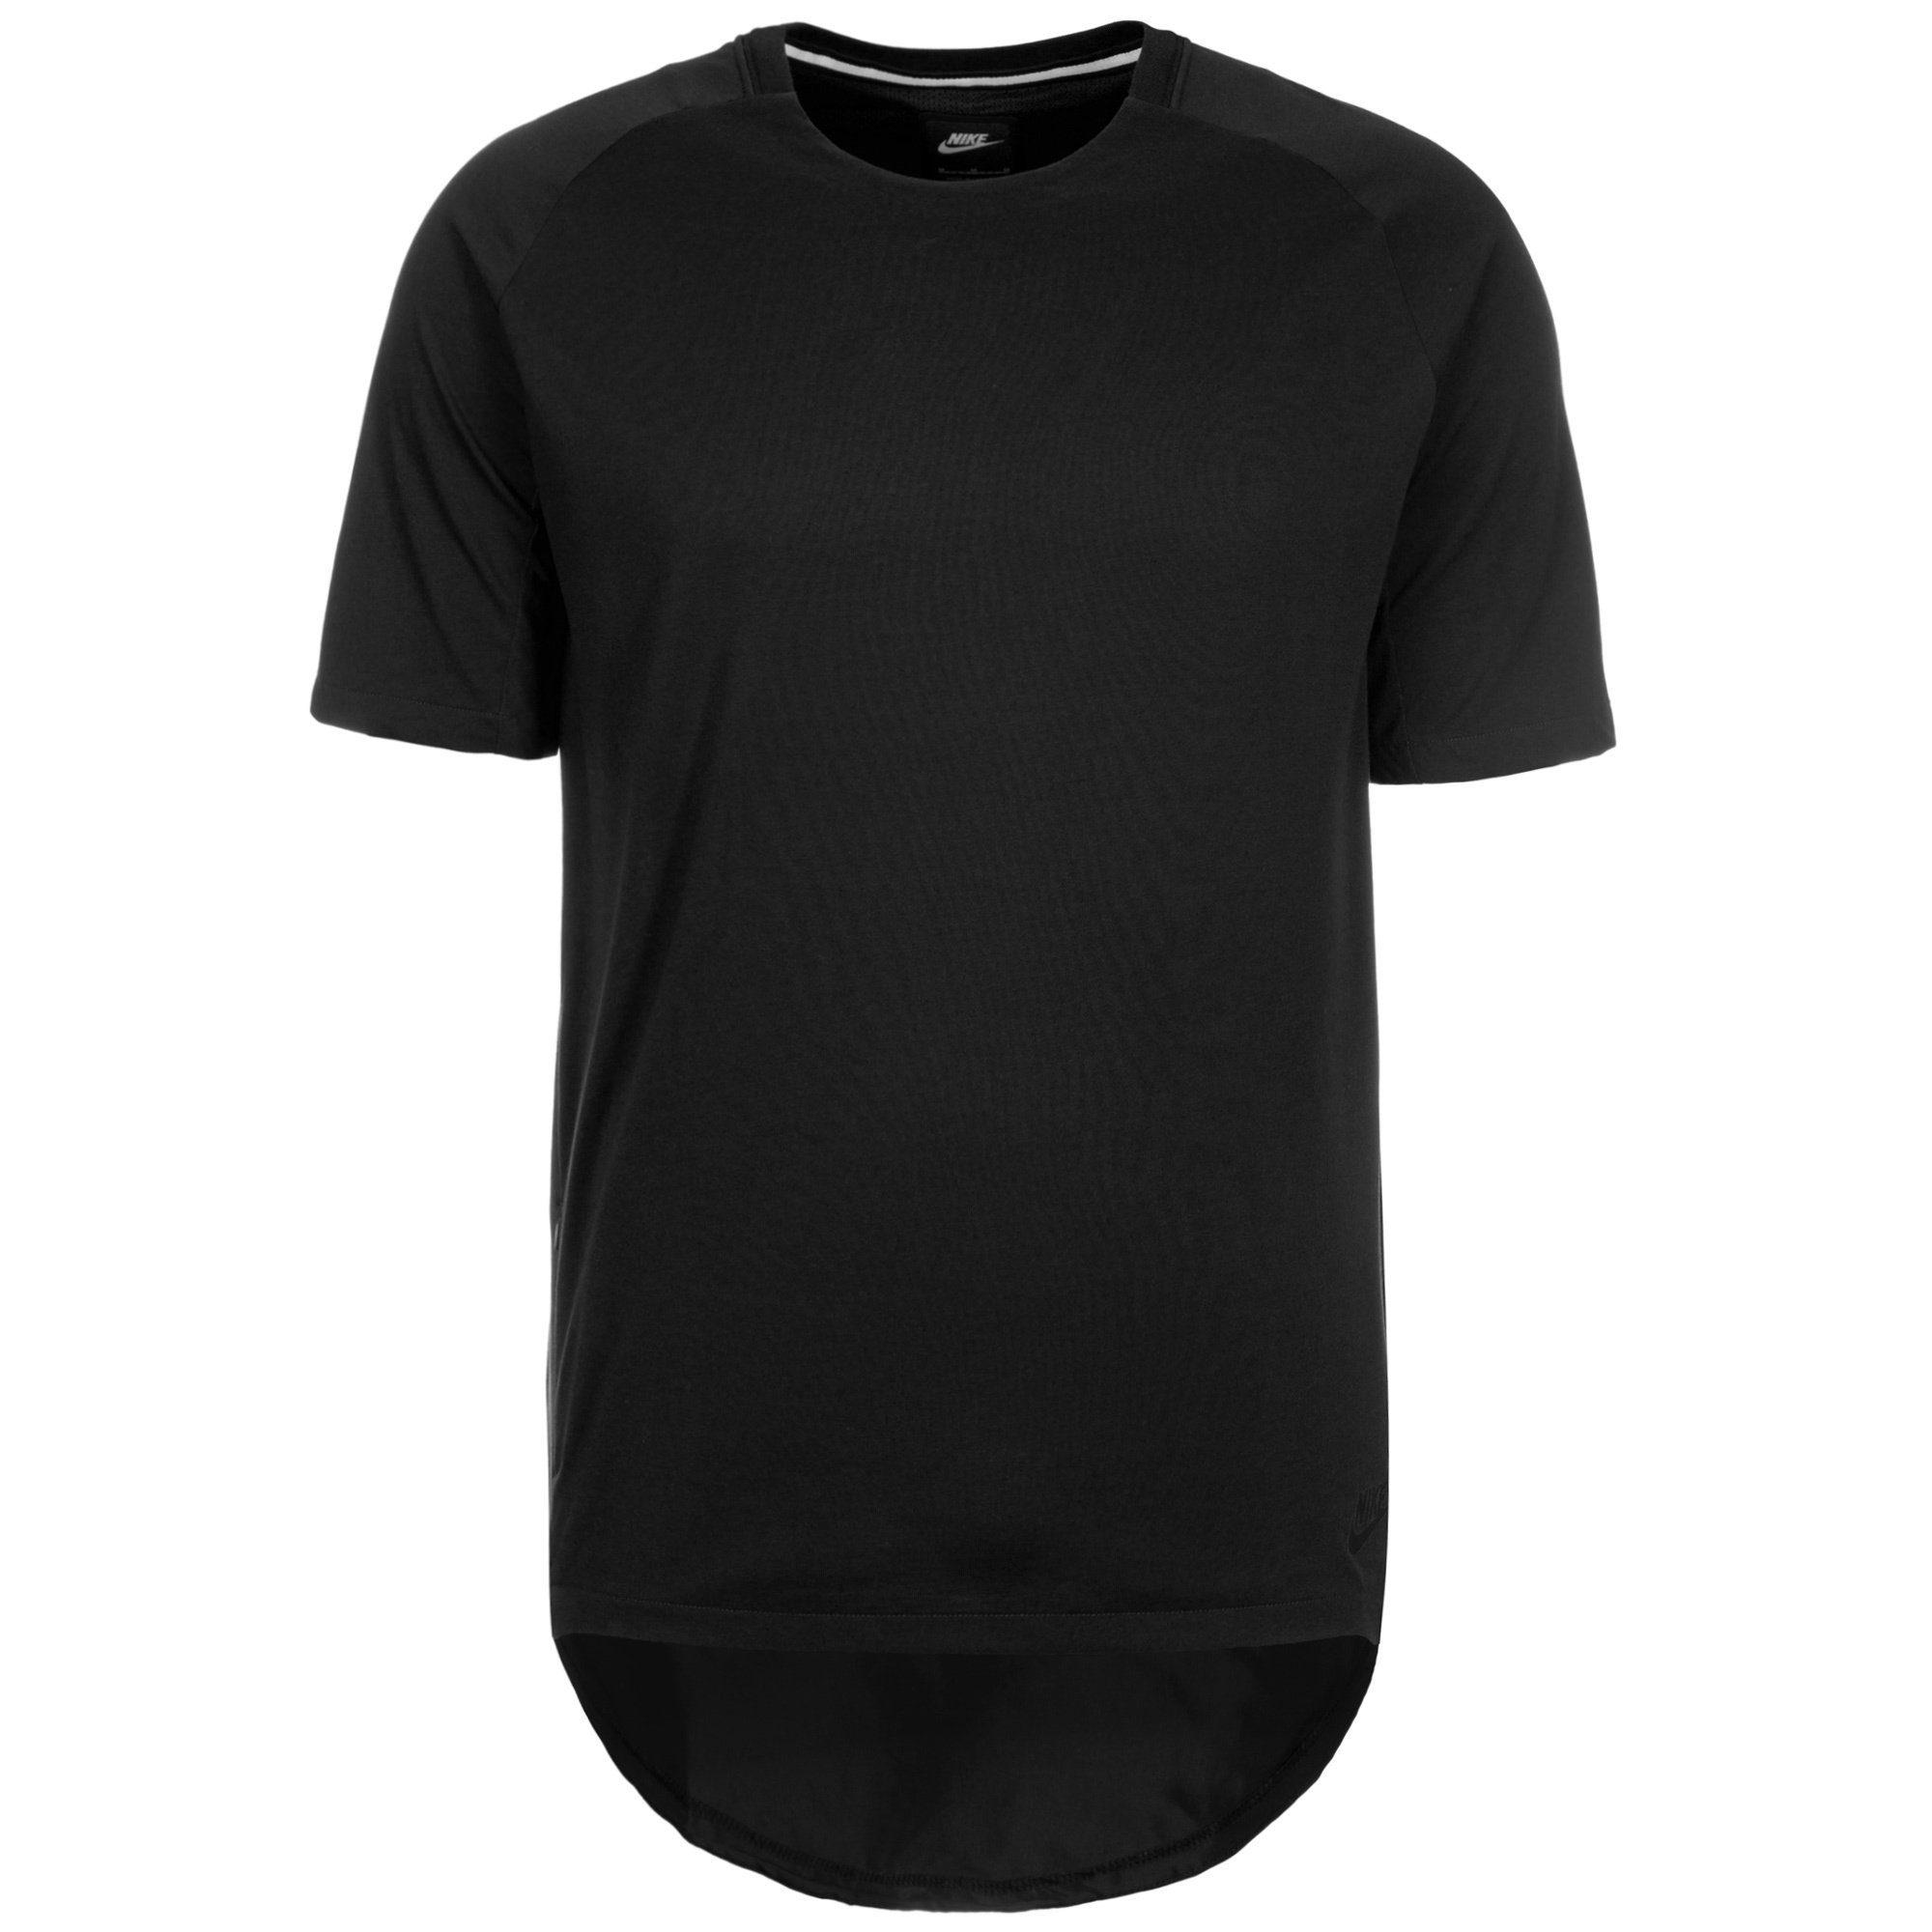 Nike Sportswear T-Shirt Bonded | Sportbekleidung > Sportshirts > T-Shirts | Schwarz | Nike Sportswear